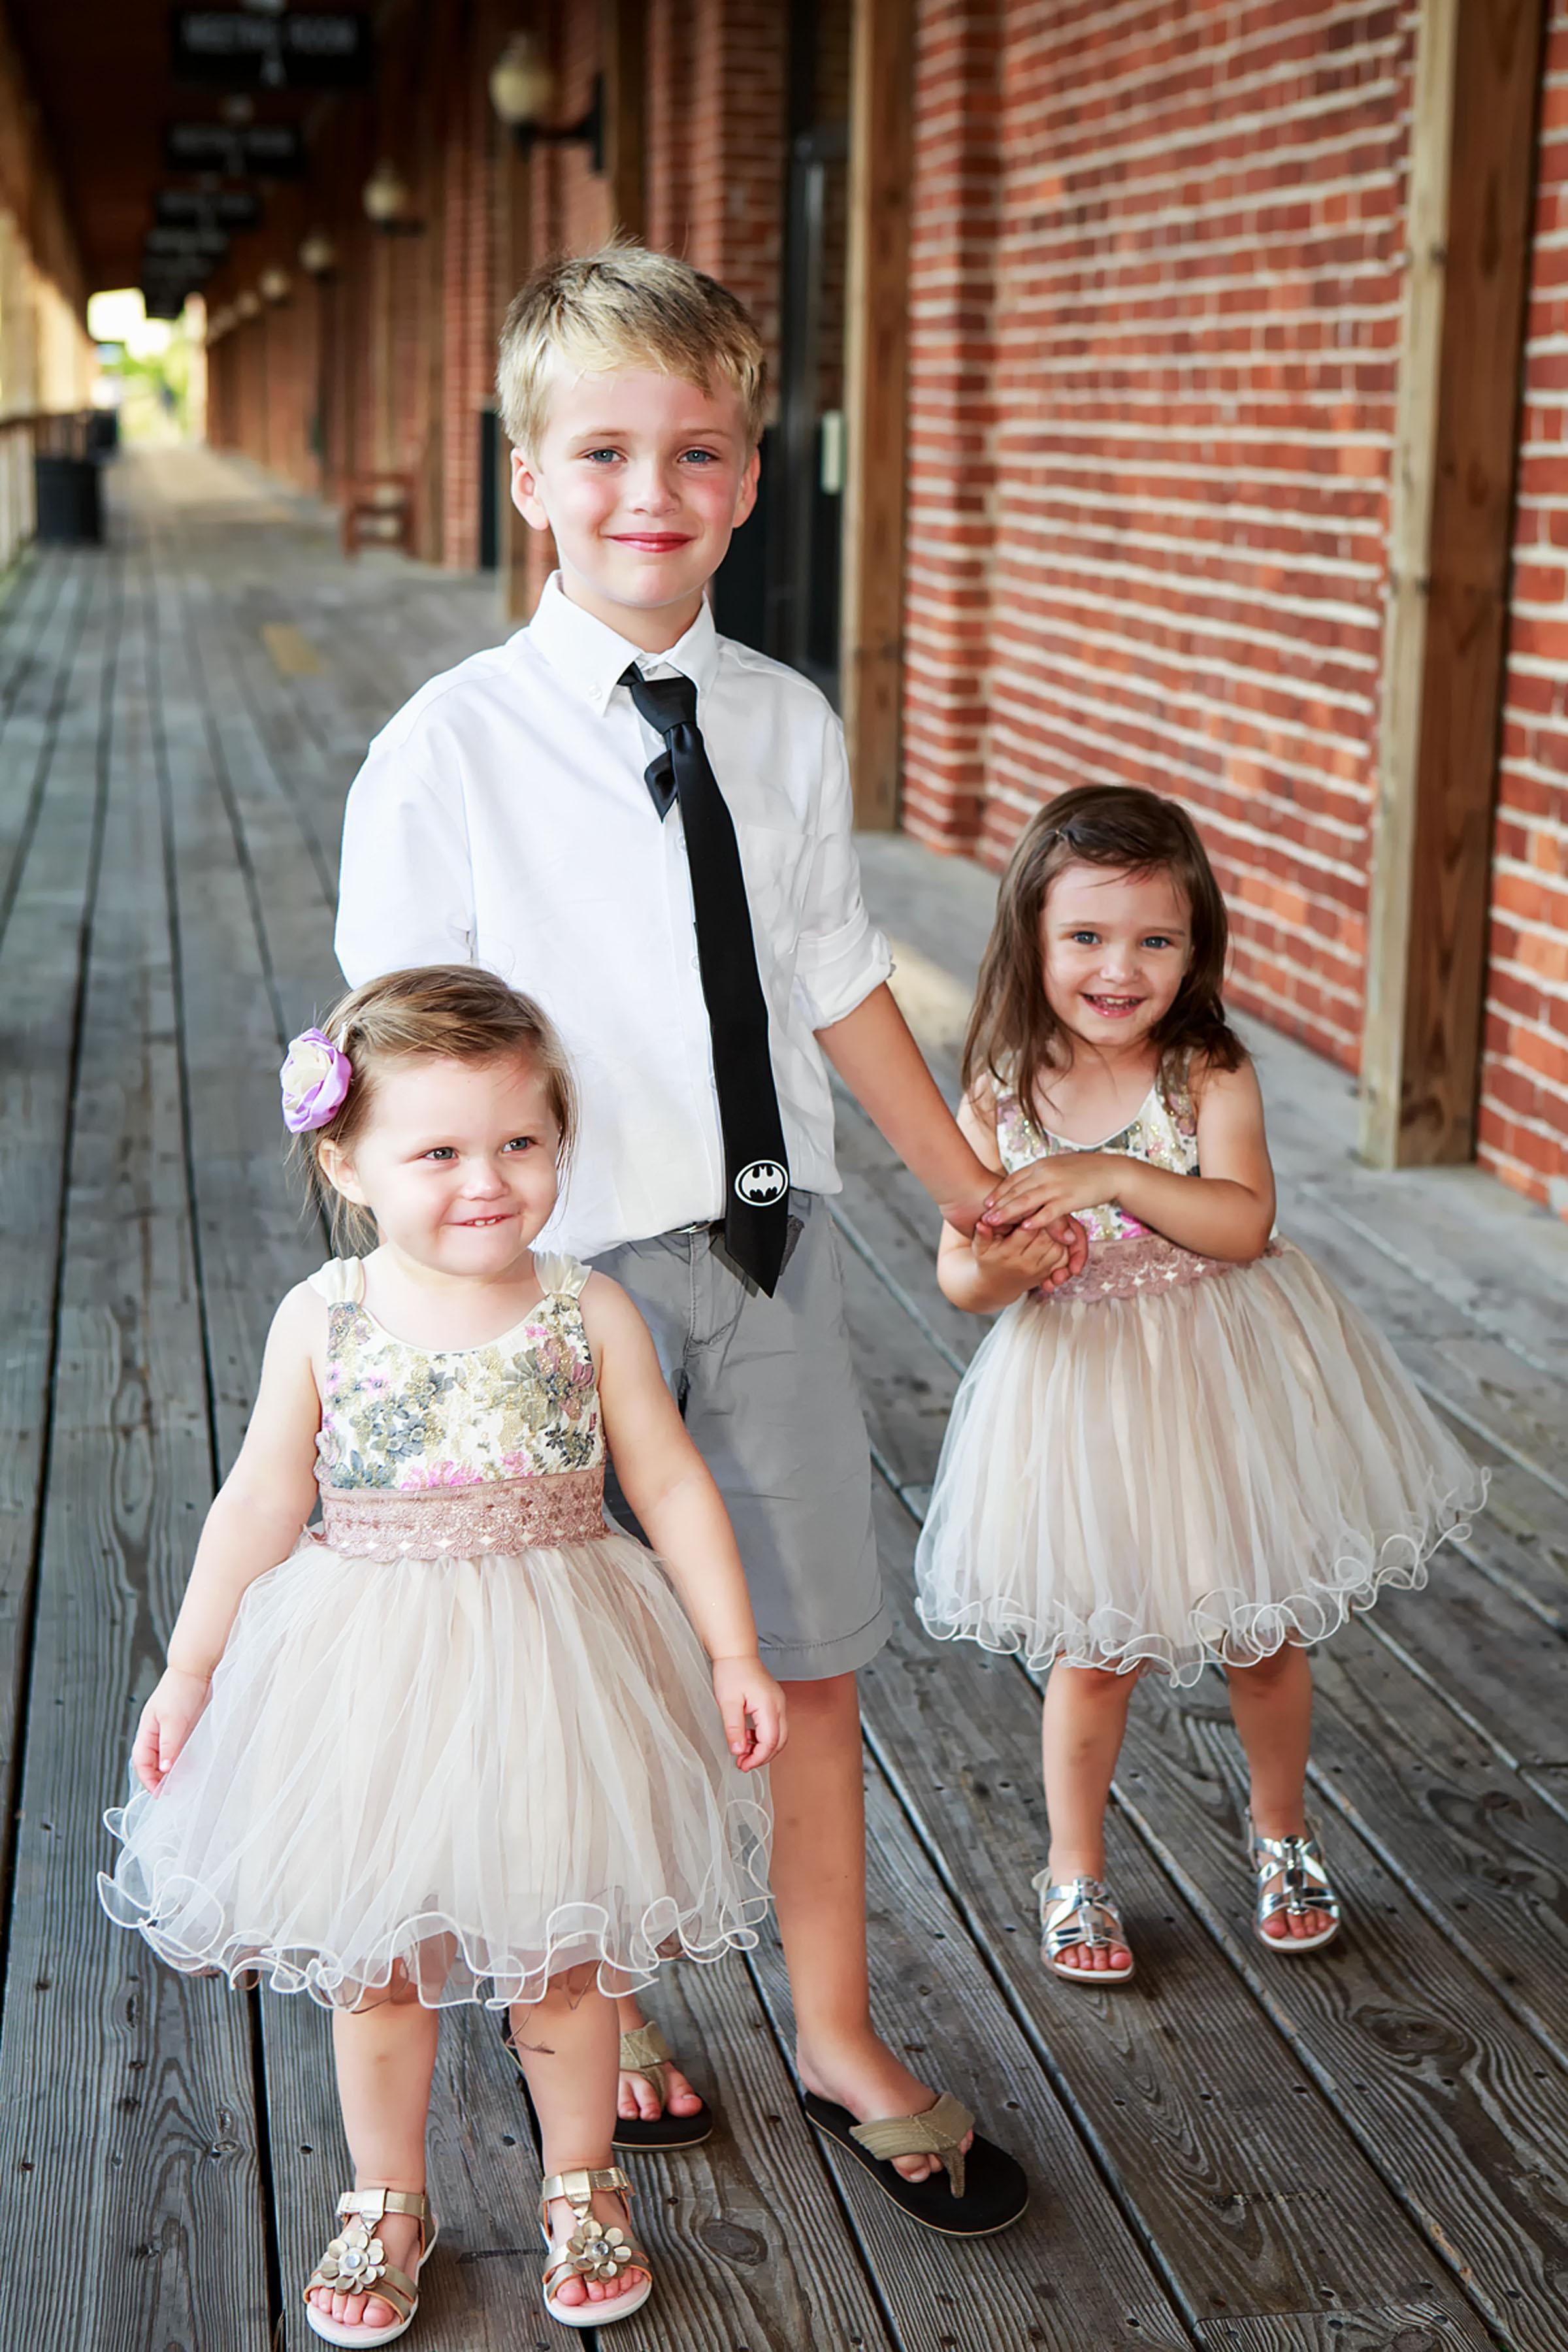 North_Carolina_Wedding_Photographer_Tiffany_Abruzzo_Reception_013.jpg